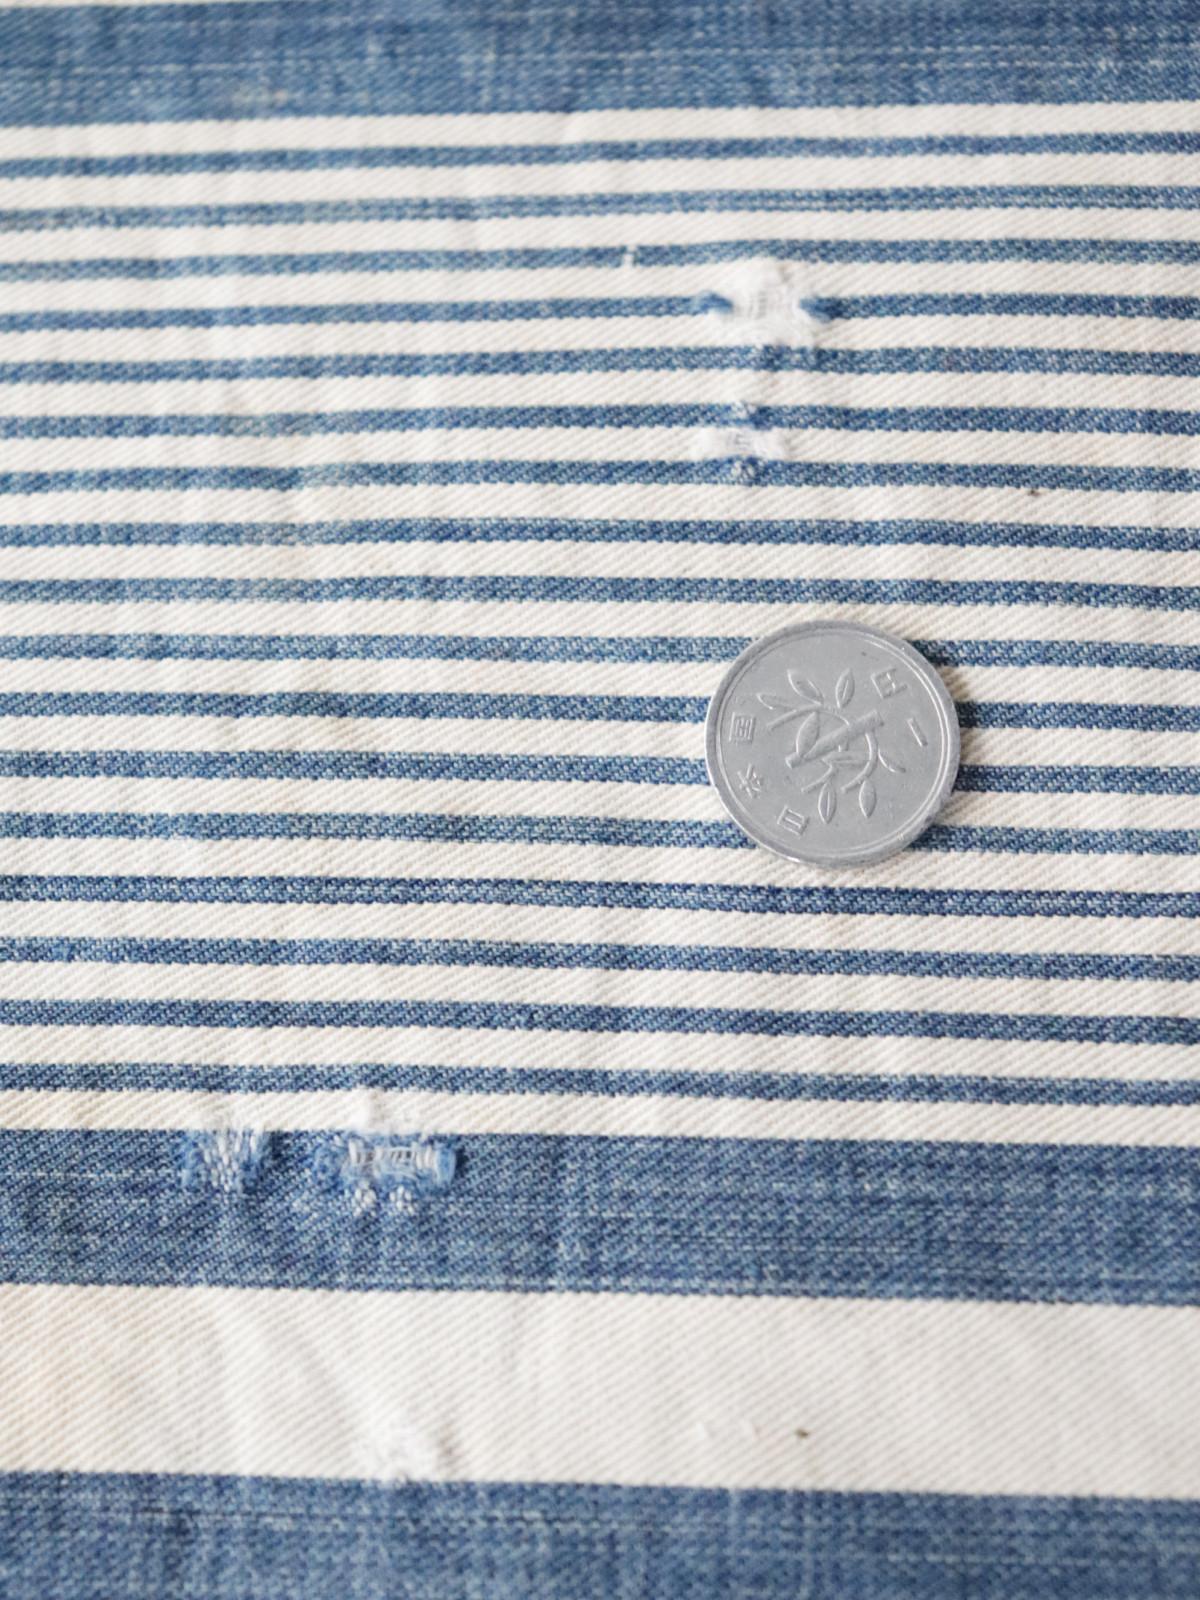 Ticking fabric ,indigo, antique, cushion, brown remake